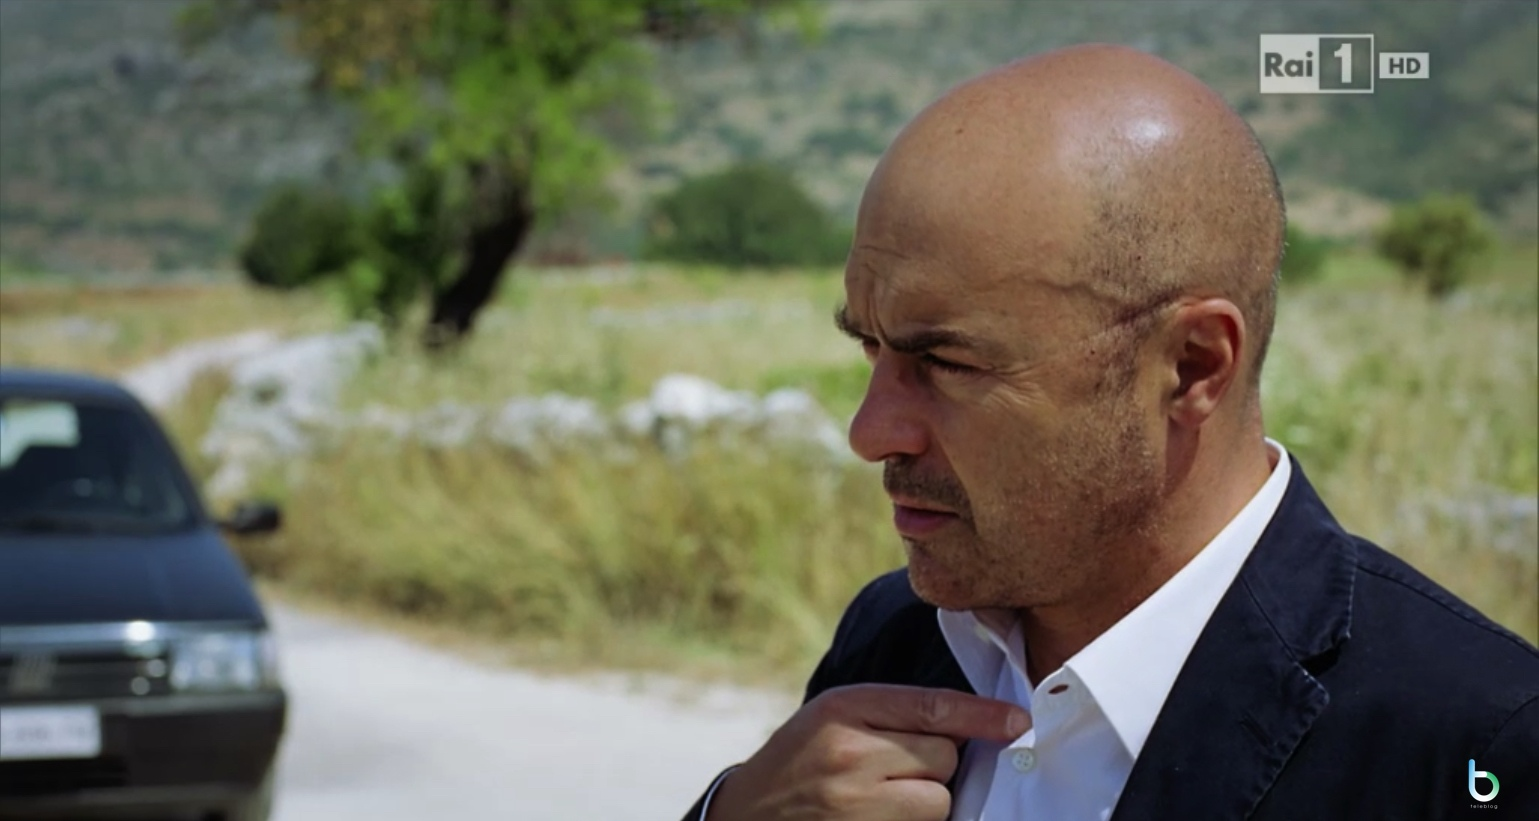 Il commissario Montalbano auditel